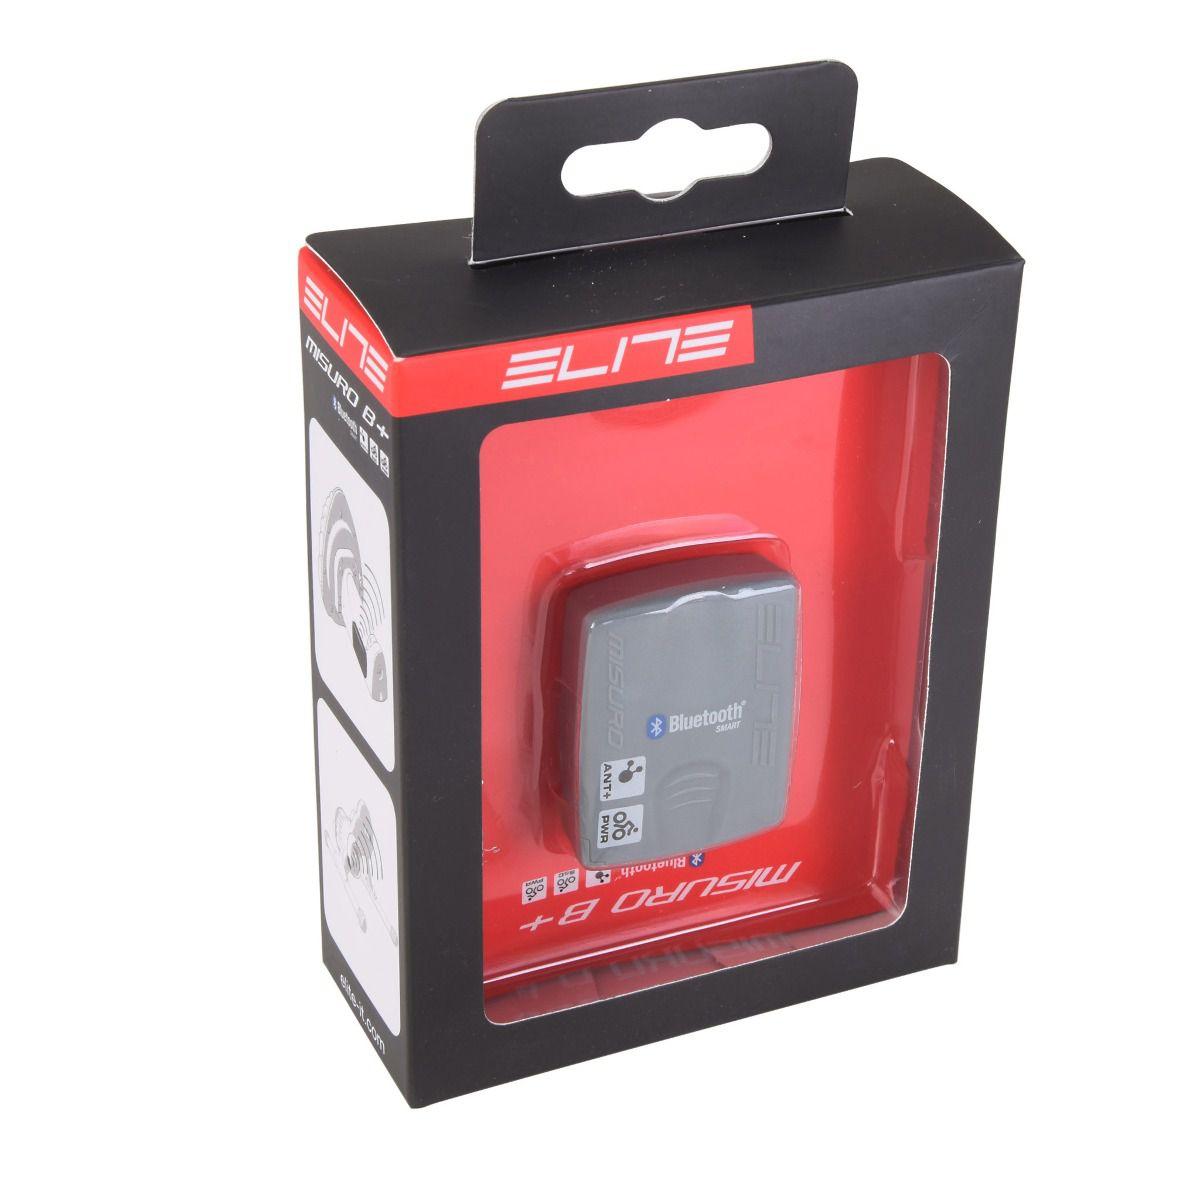 Rolo De Treinamento Elite Novo Force + Sensor Misuro Elite B+ Bluetooth